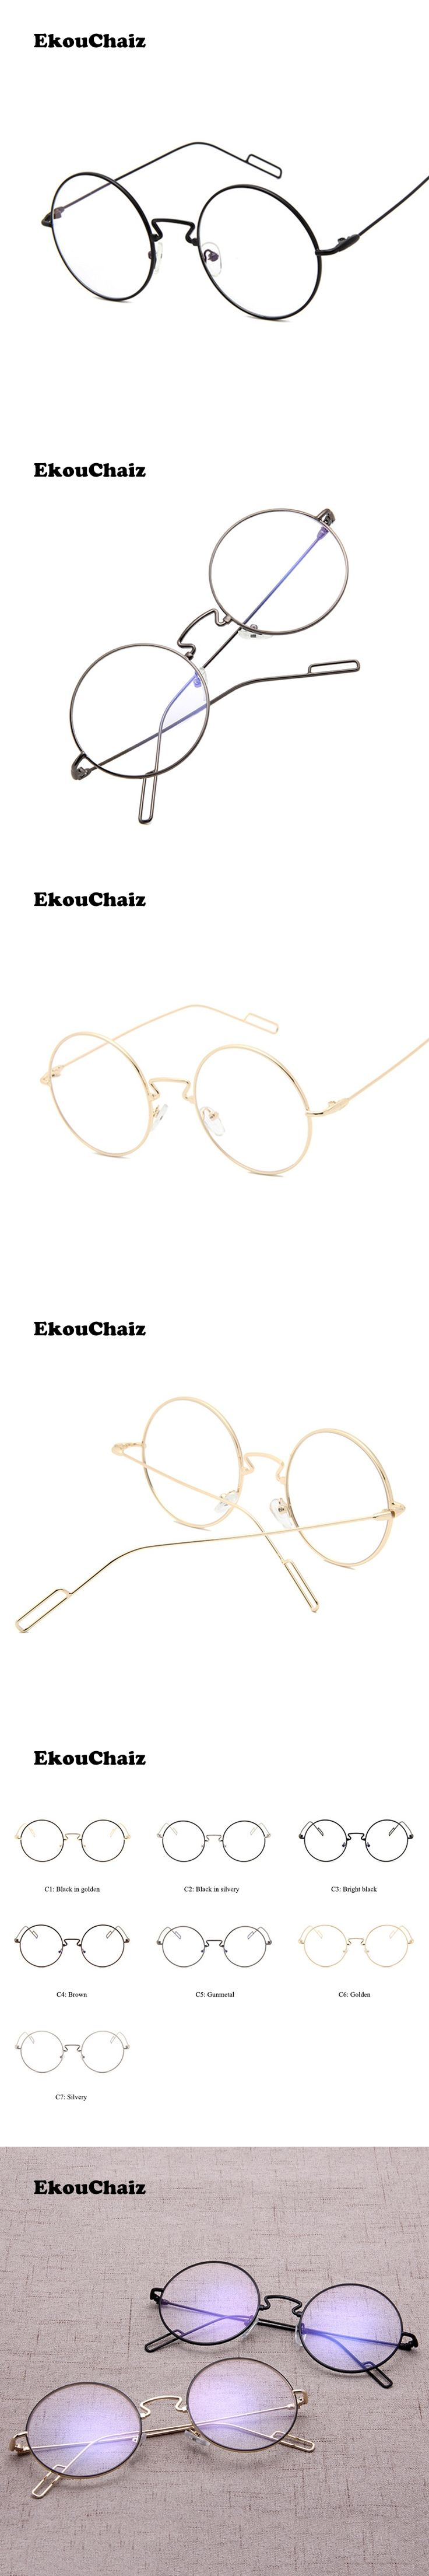 EkouChaiz Fashion Style Glasses Frames Solid Unisex Trend Comfortable Oval Design Frame Glass Eyewear Accessories 2017 Popular